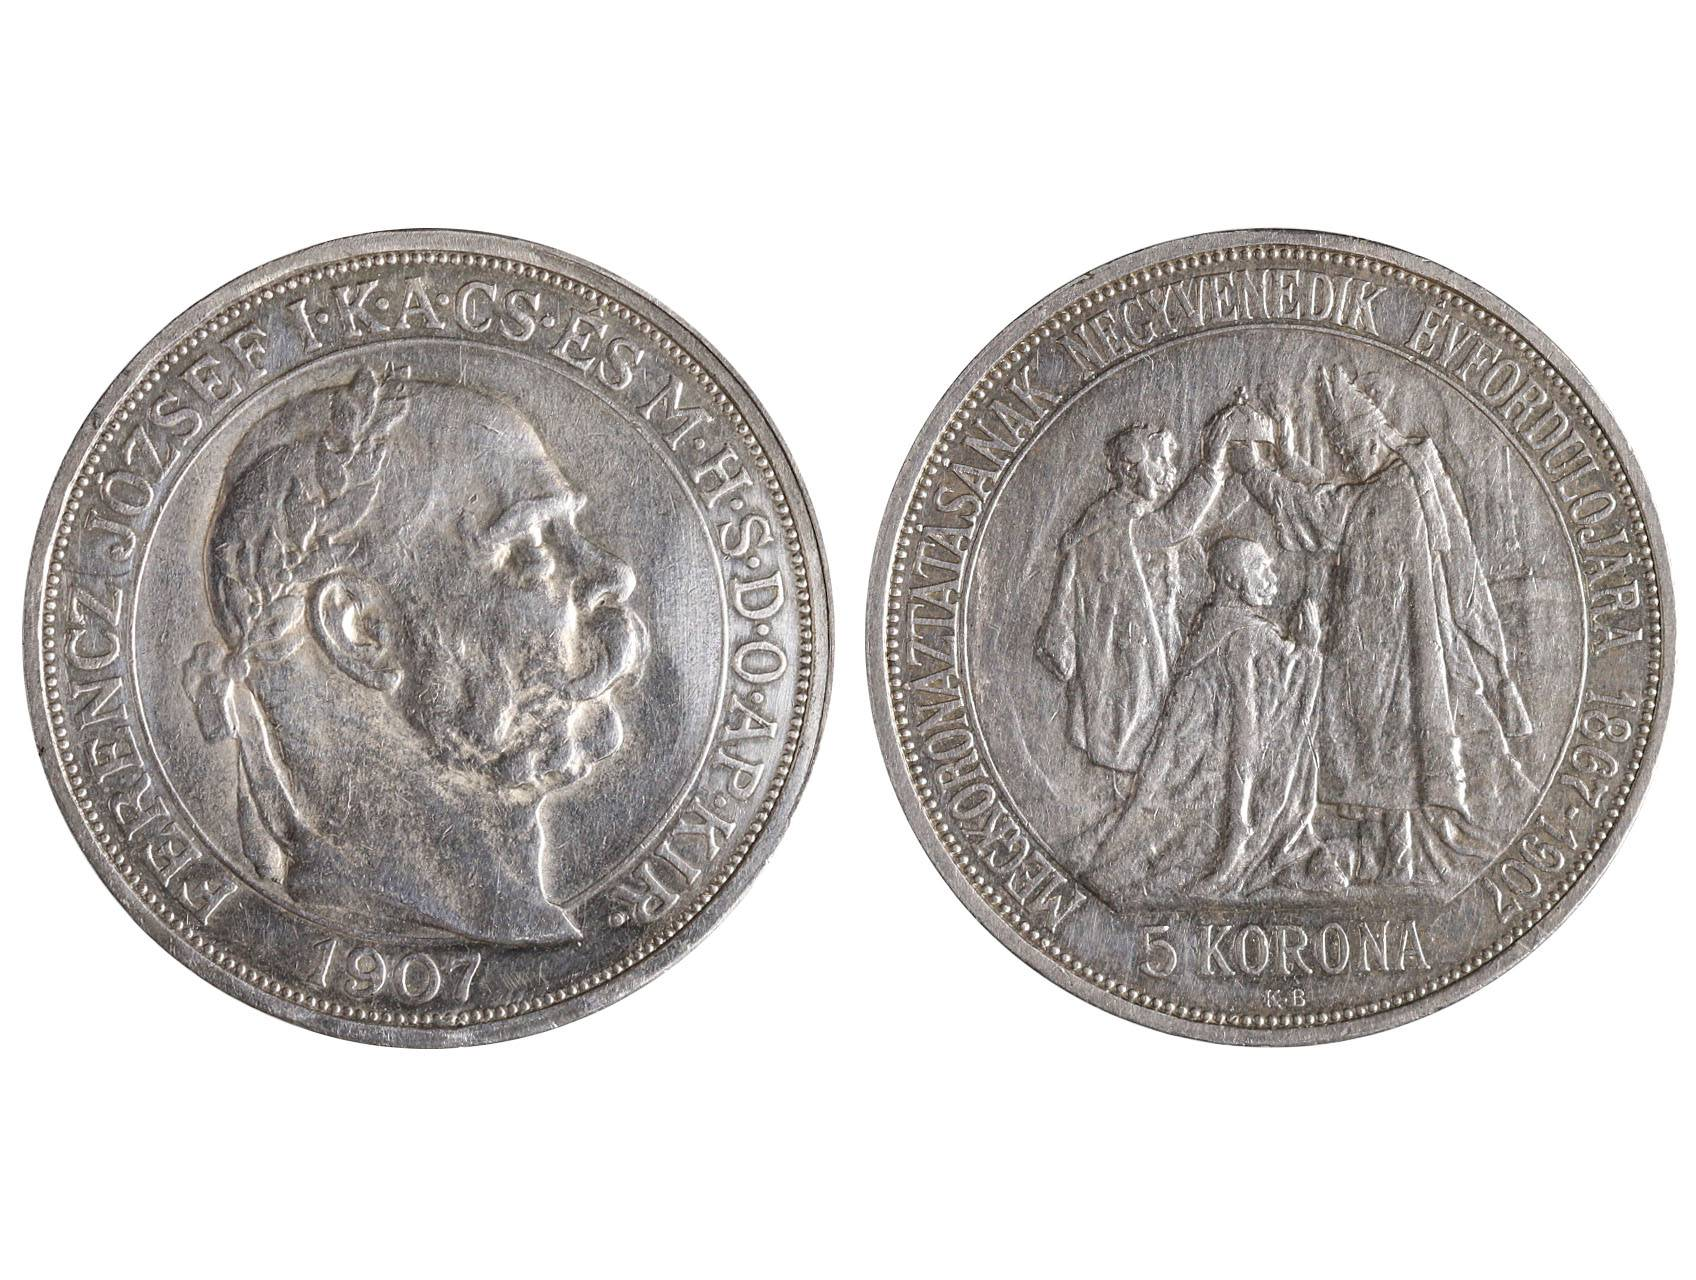 František Josef I. 1848-1916 - 5 Koruna 1907 KB, 40. výročí korunovace F.J.I., N158